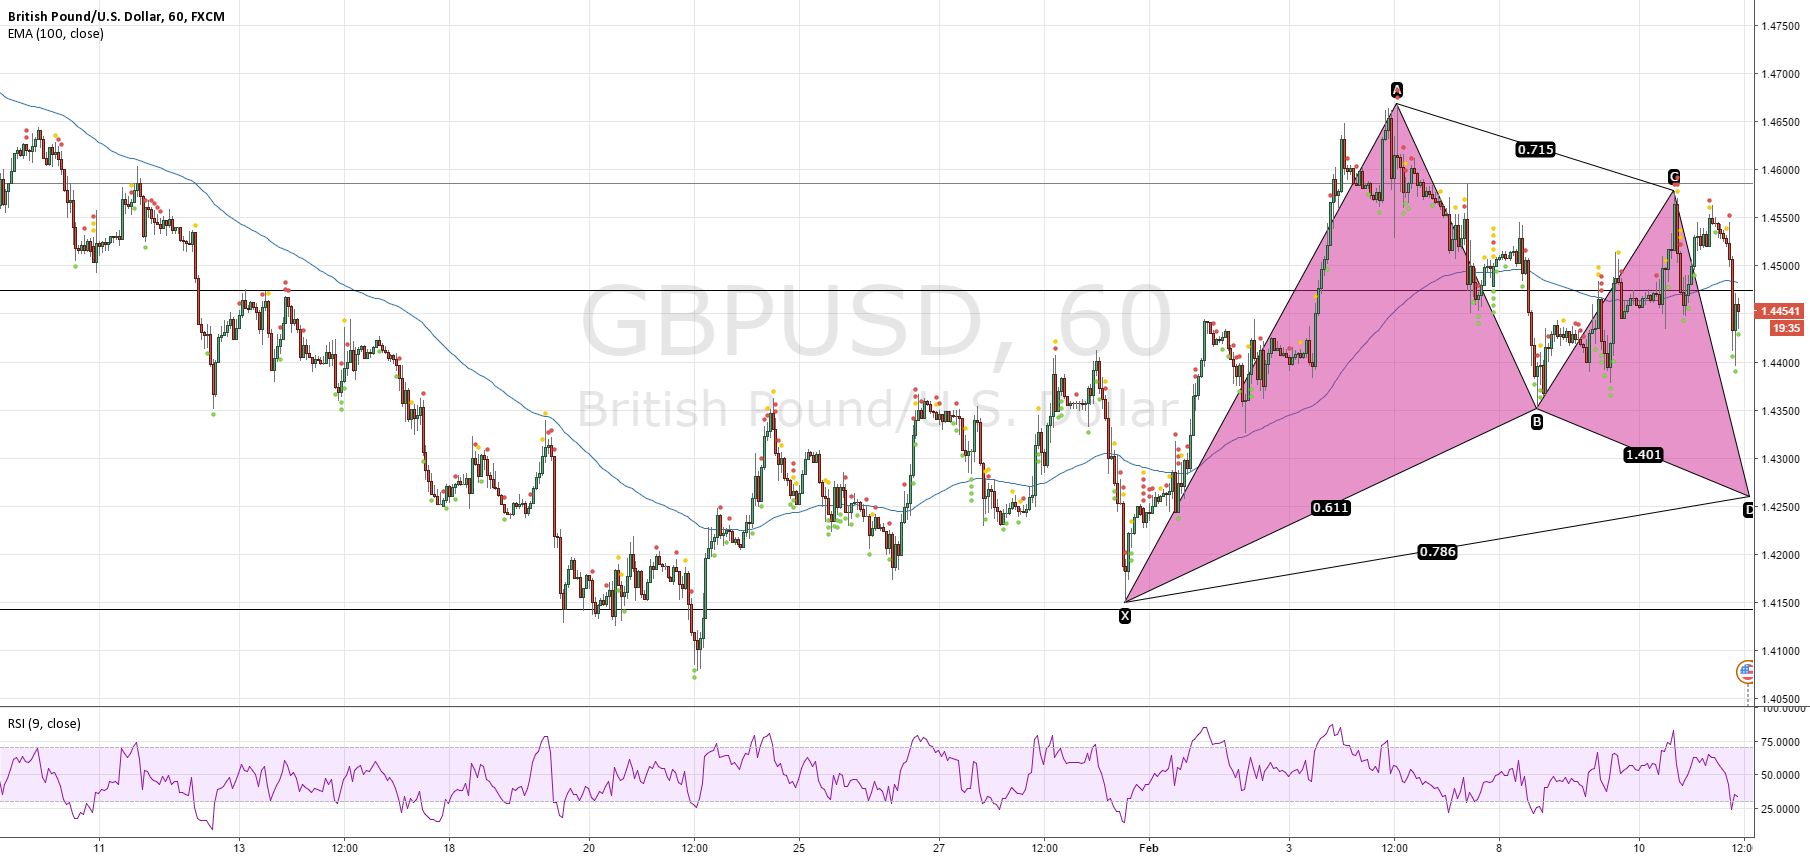 GBPUSD Potential Bull Gartley